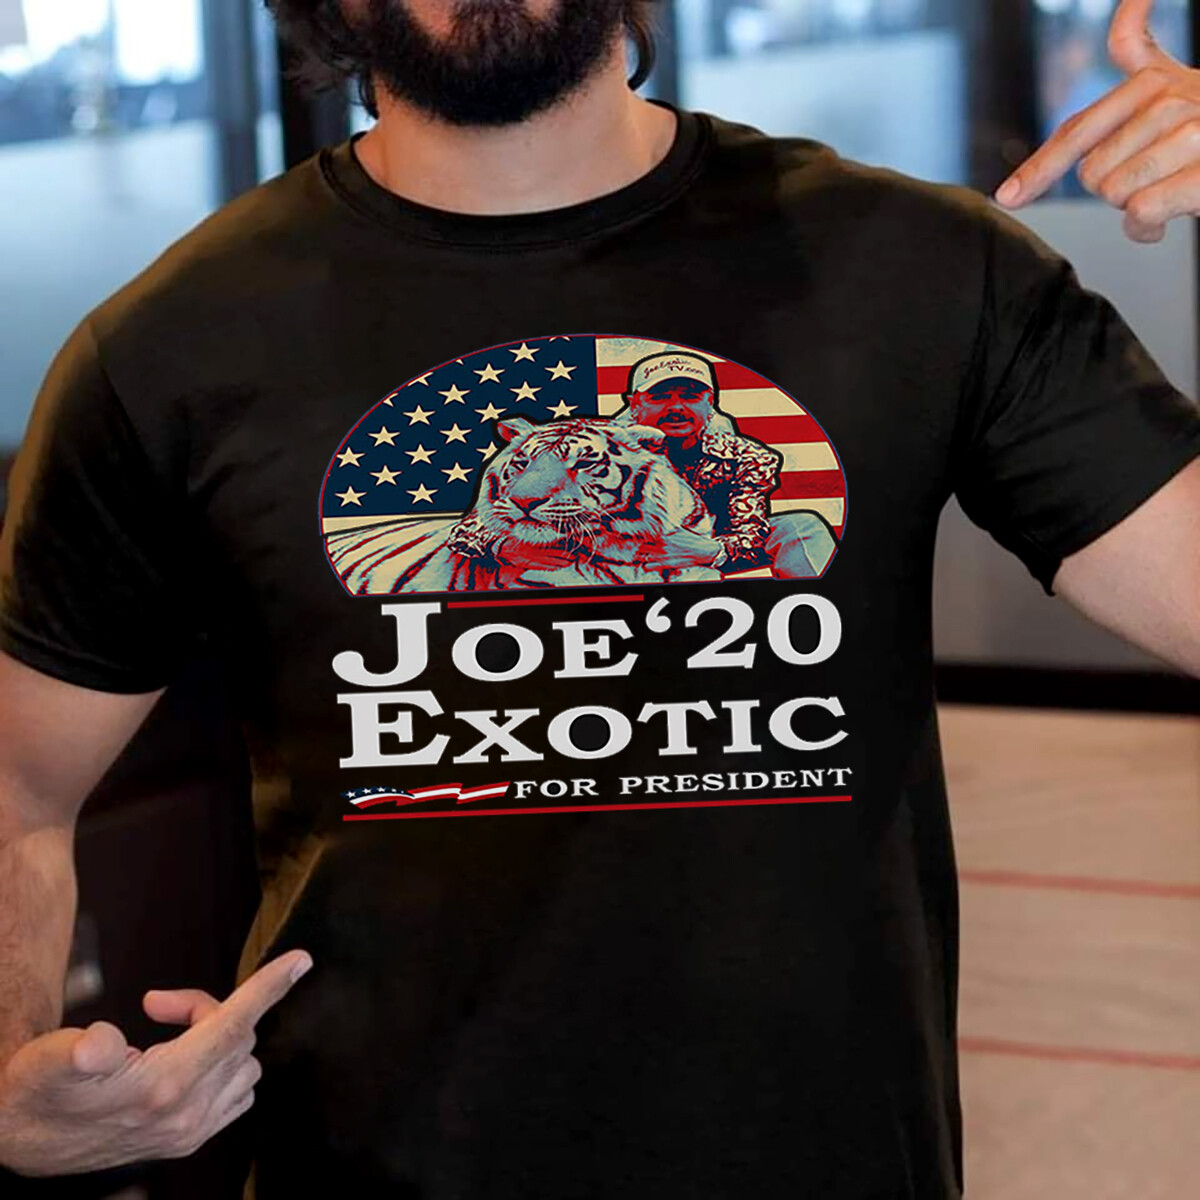 Costcotee Joe Lovers Exotic 2020 for President Funny T Shirt Unisex Shirt Short-Sleeve Long-Sleeve V-Neck Tank Pullover Hoodie Sweatshirt Men Women Tee Gift